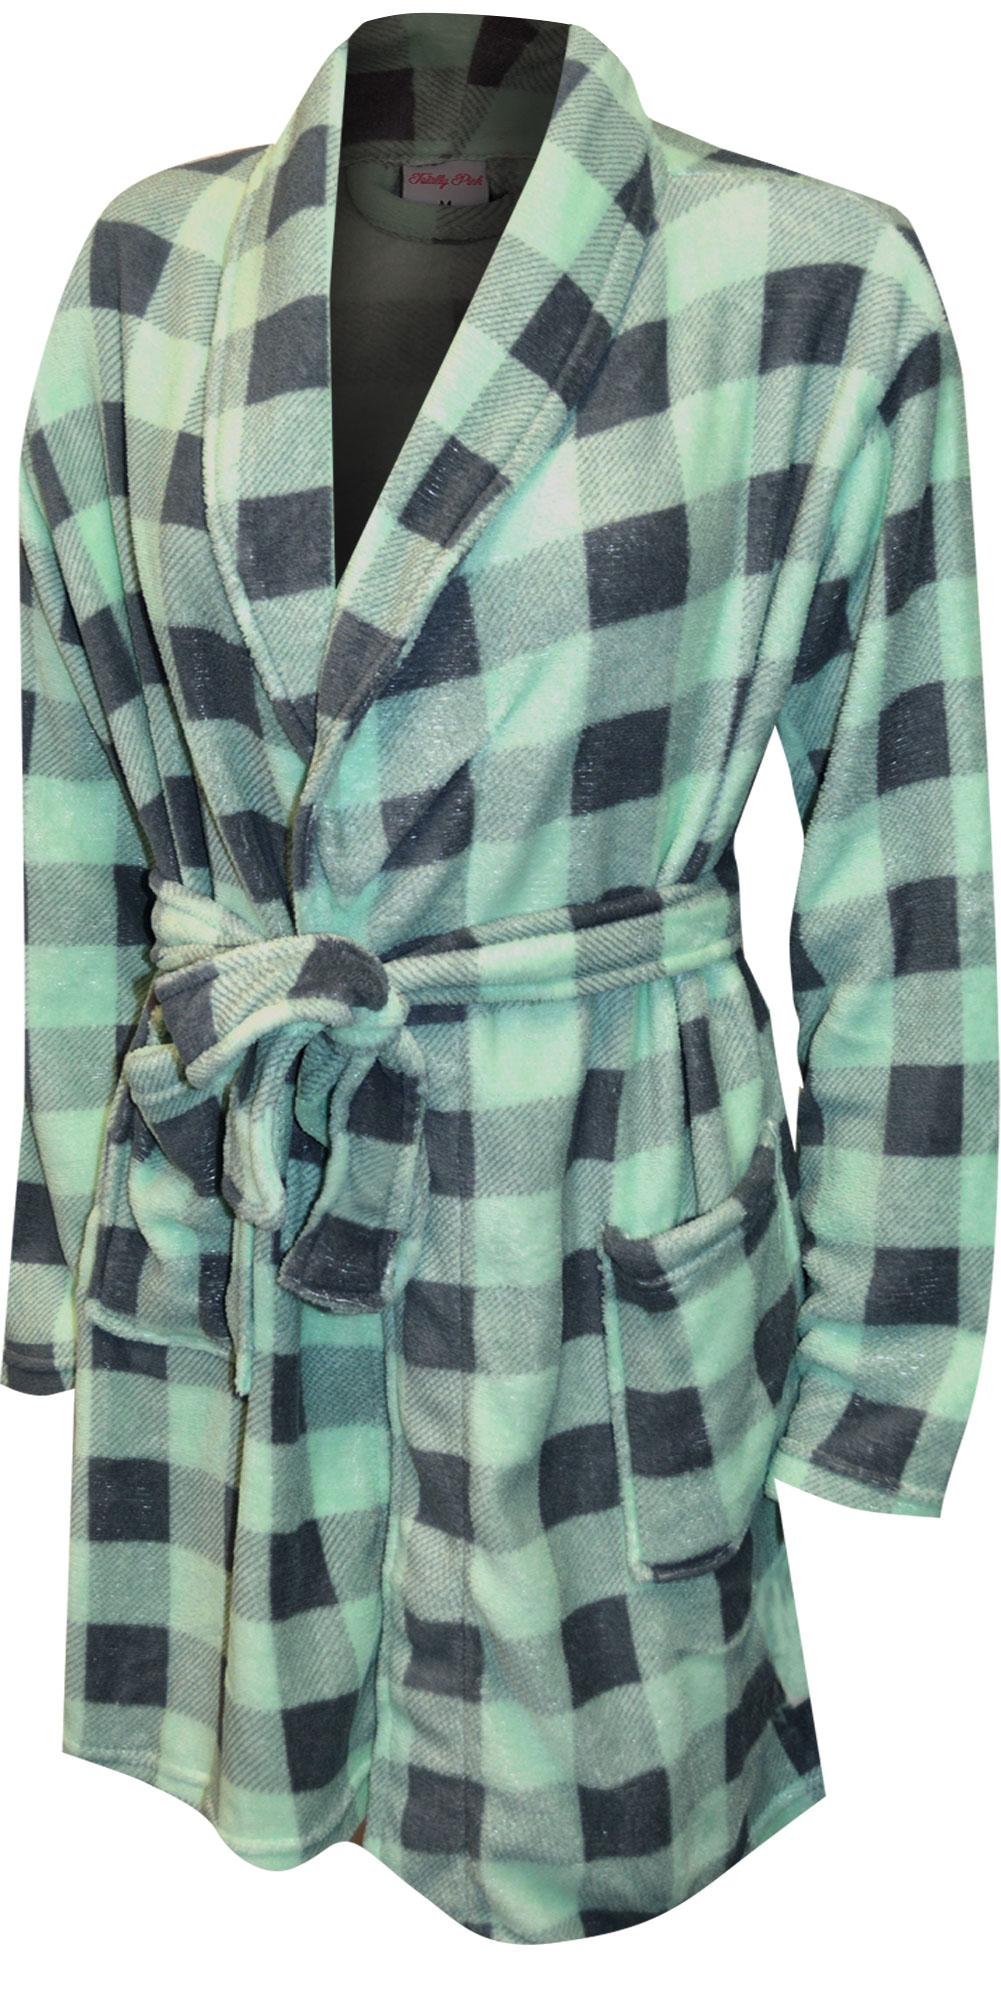 Image of Mint Green and Gray Buffalo Plaid Print Plush Robe for women